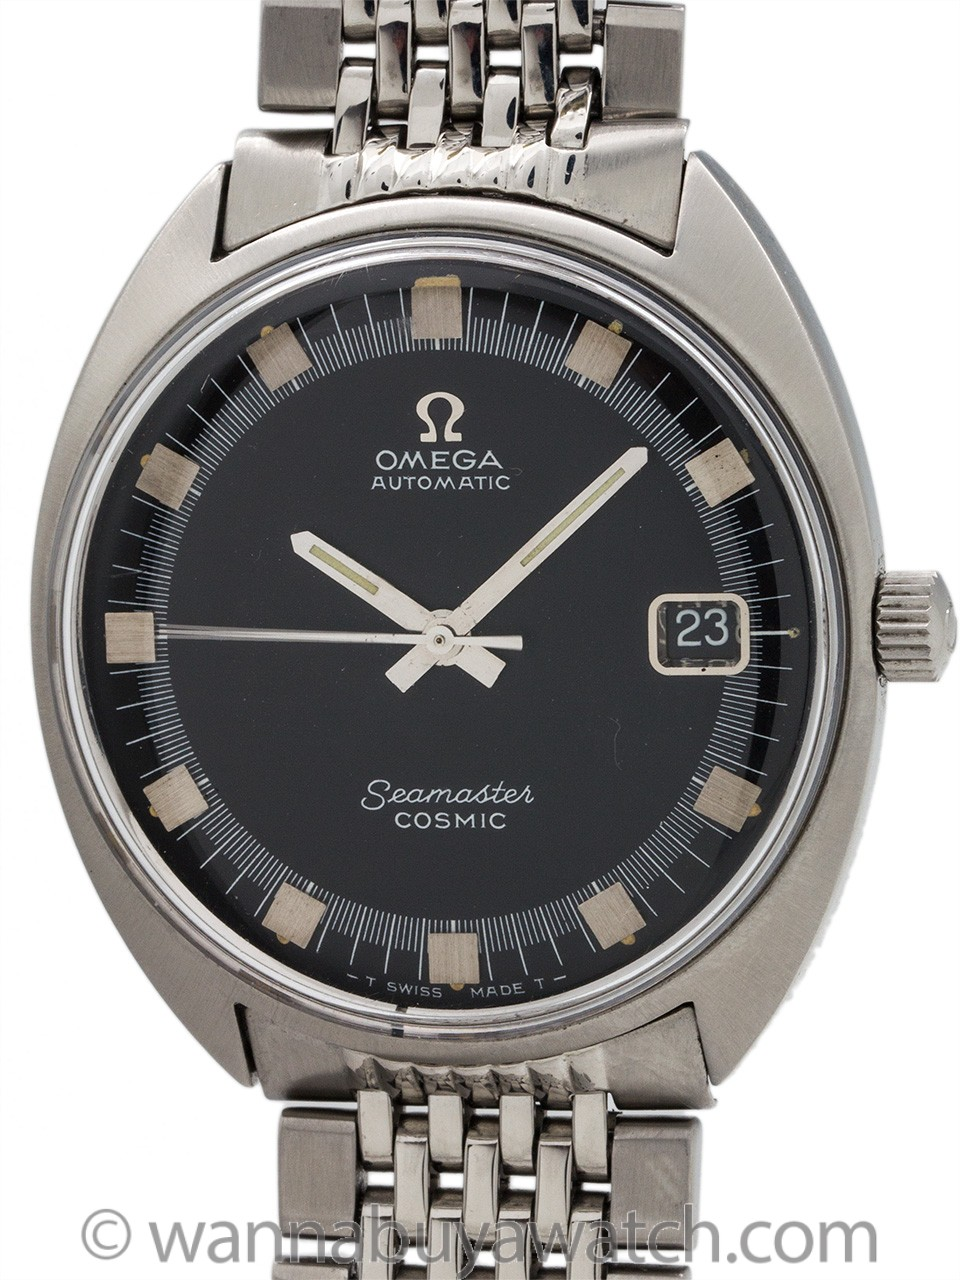 Omega Automatic Seamaster Cosmic circa 1970